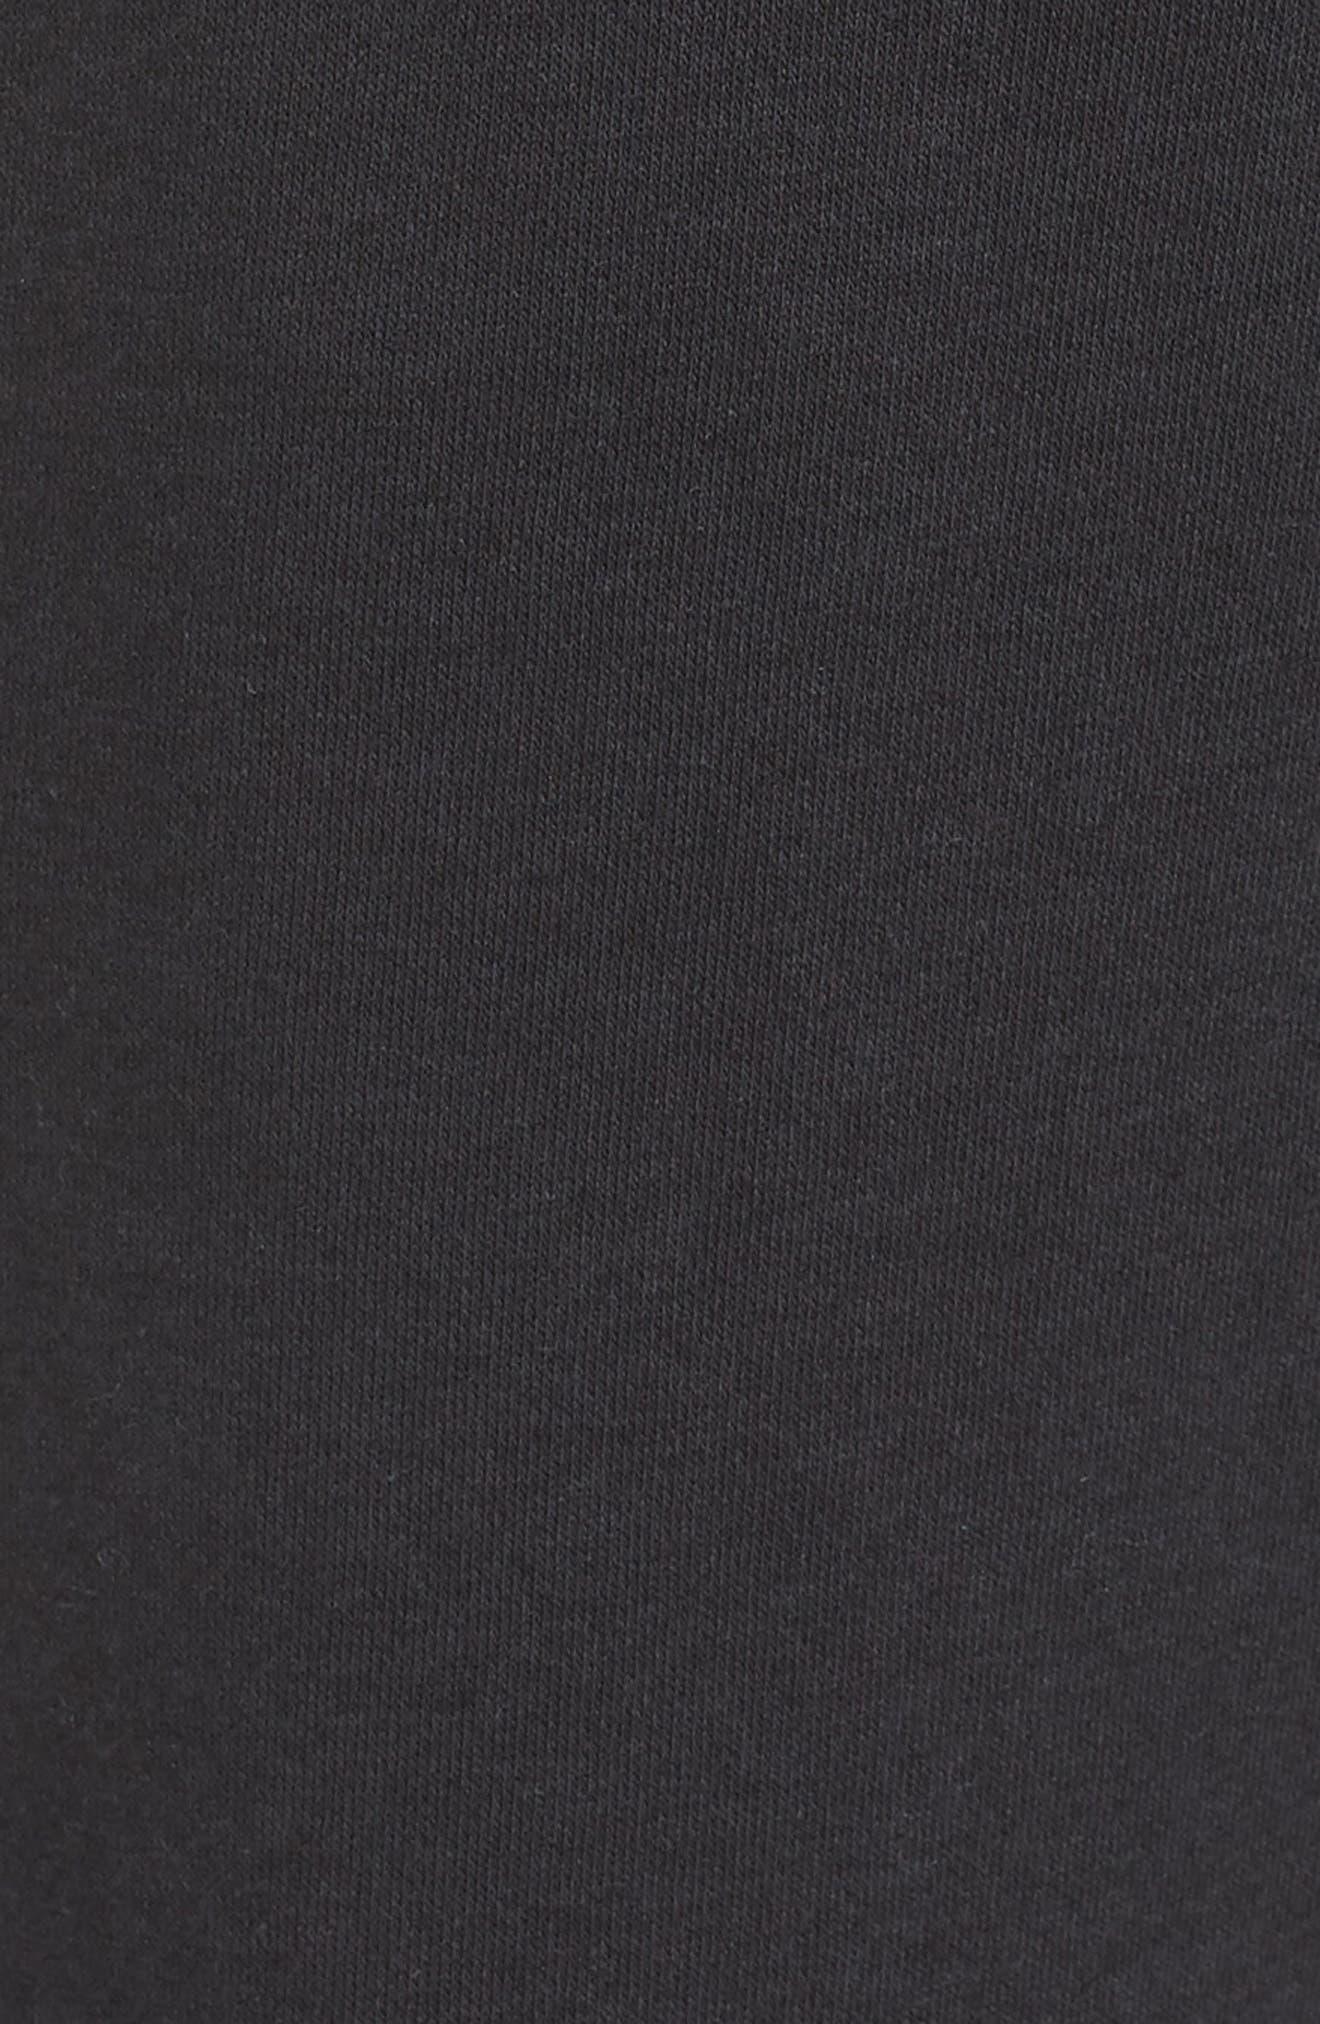 Sportswear Rally Jogger Pants,                             Alternate thumbnail 6, color,                             BLACK/ BLACK/ WHITE